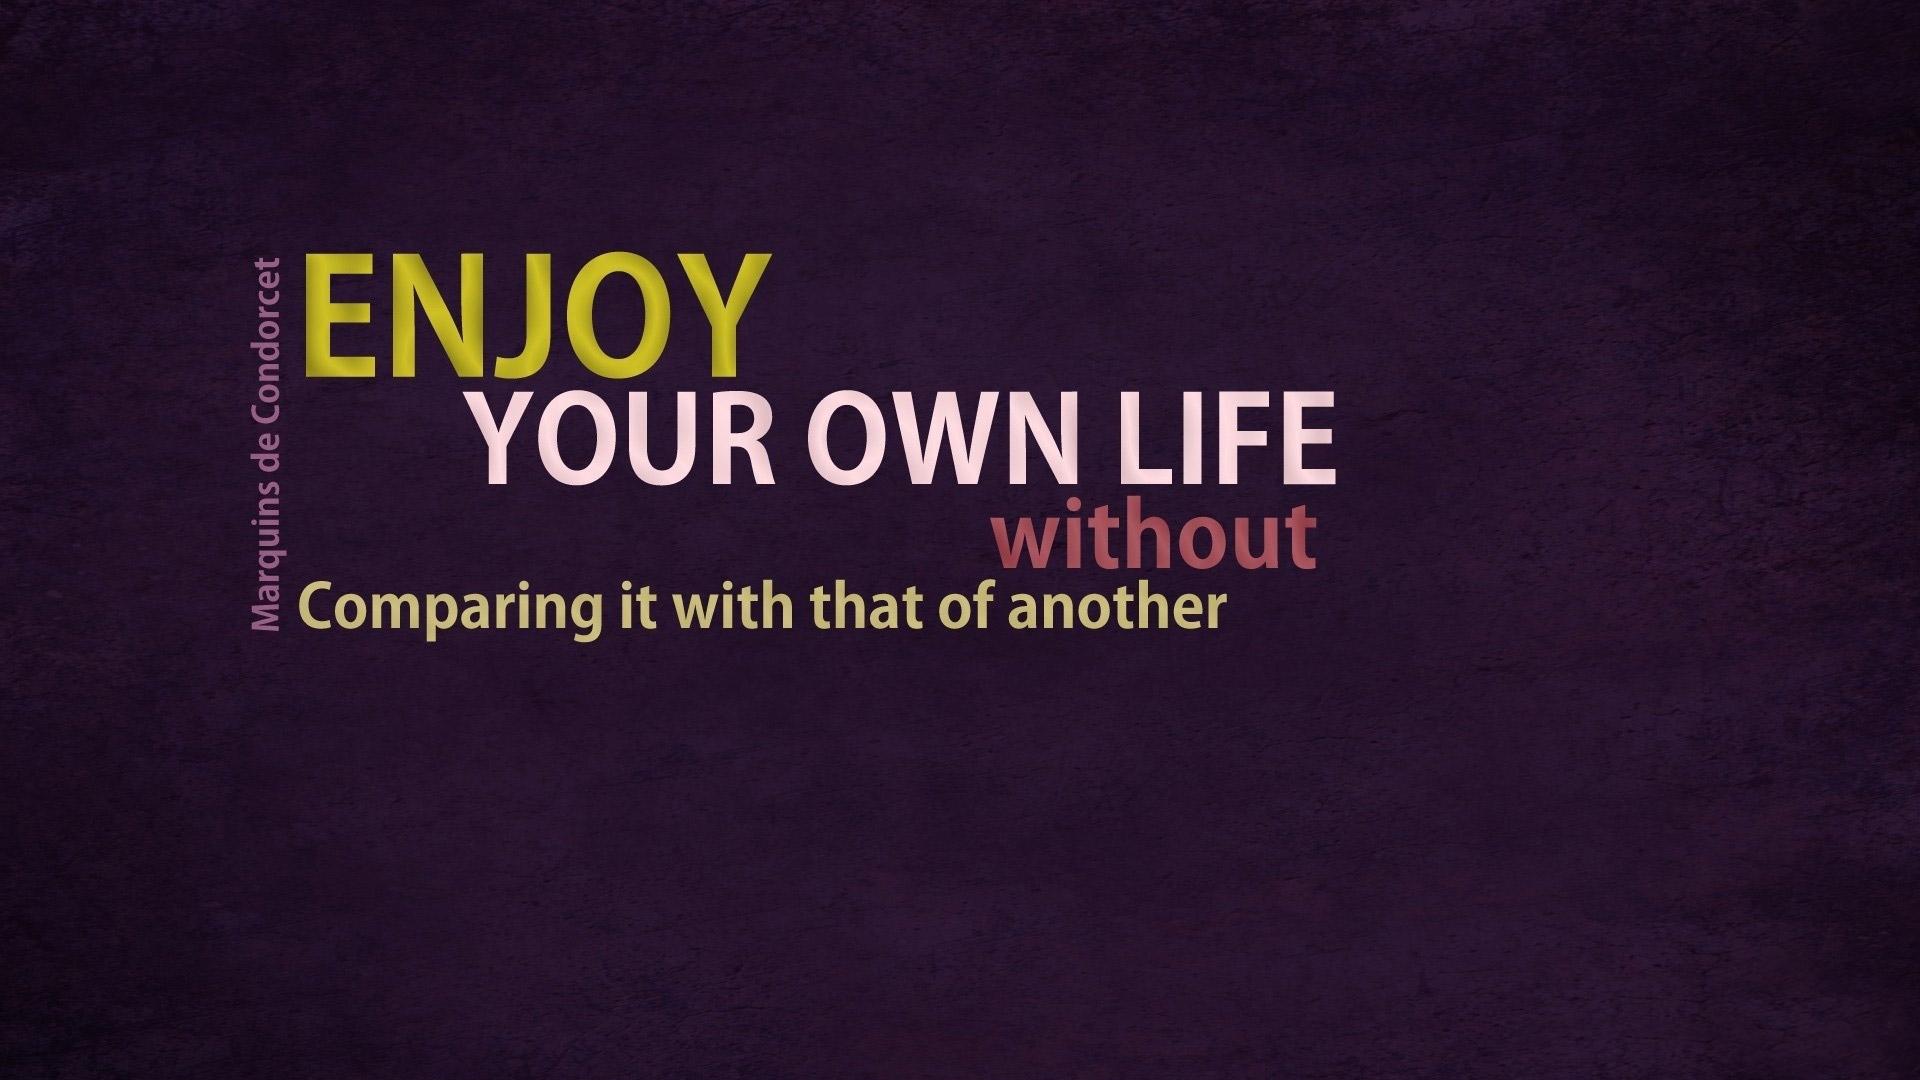 motivational quotes wallpaper hd